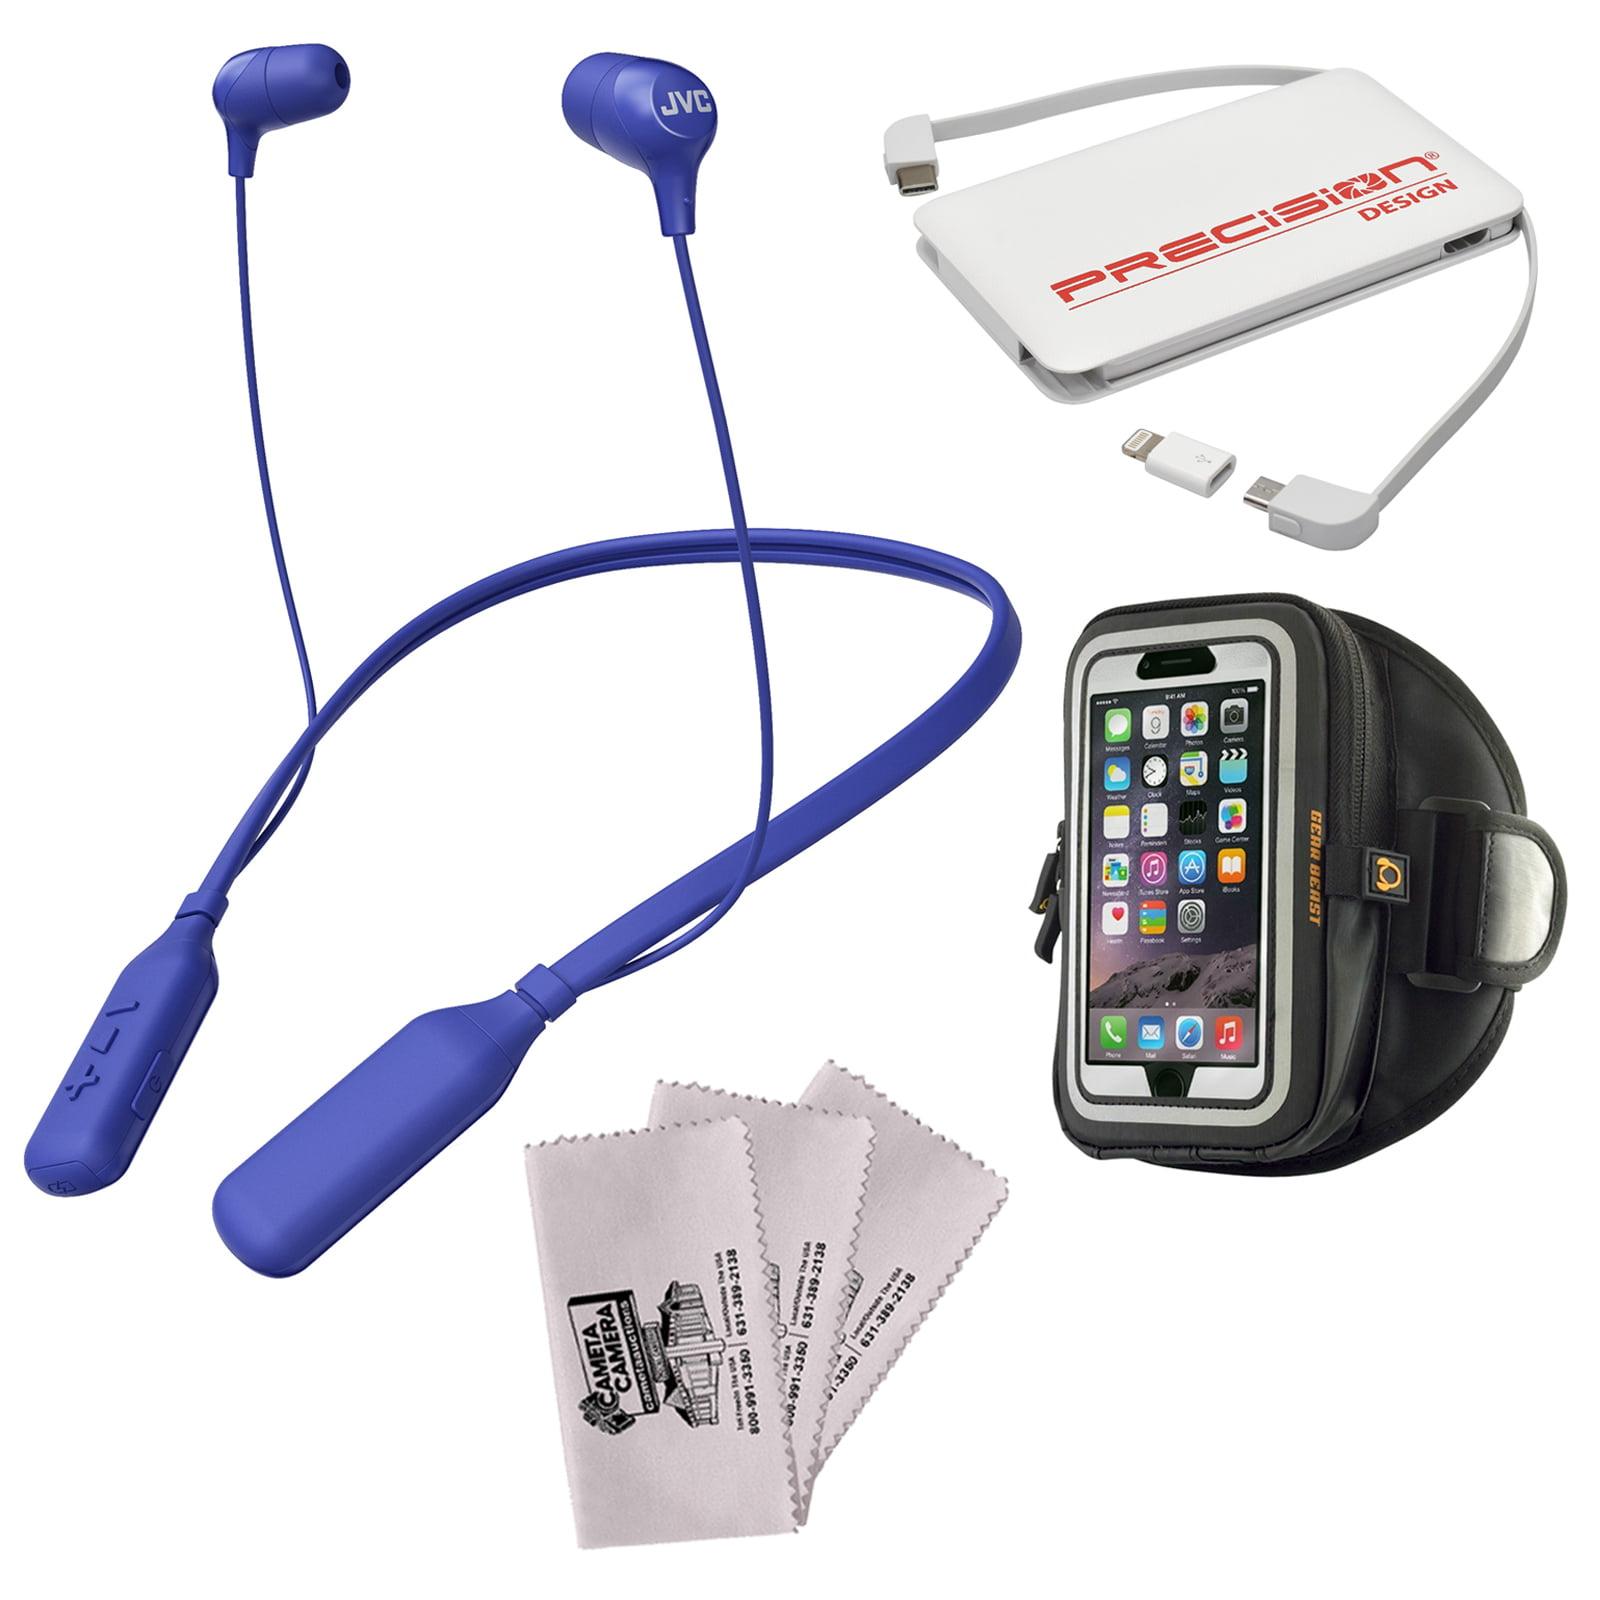 JVC HA-FX39BT MARSHMALLOW Bluetooth Inner Ear Headphones (White) + Power Bank + Smartphone Sport Armband + Kit